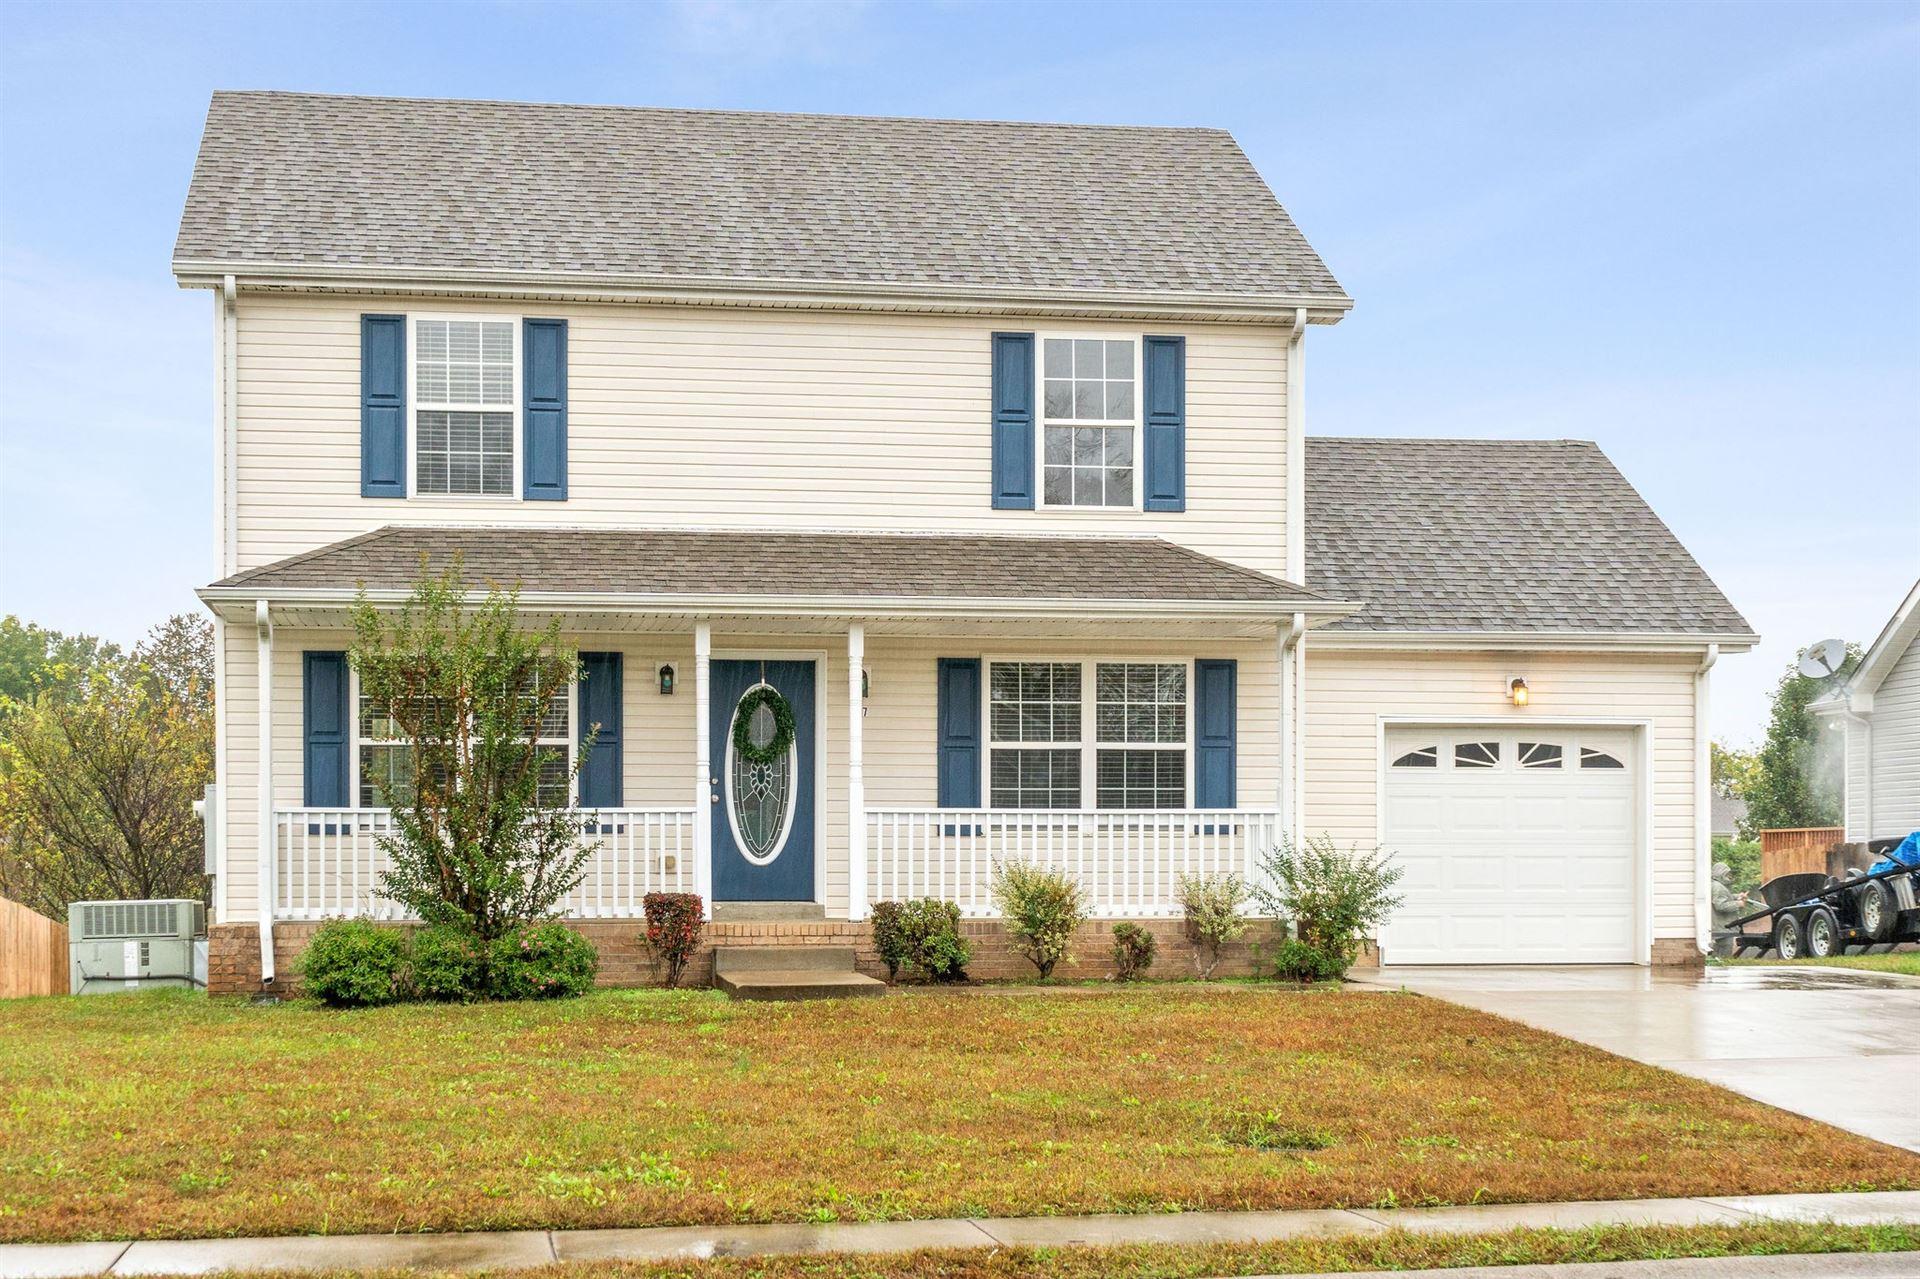 1817 Abrams Rd, Clarksville, TN 37042 - MLS#: 2203024